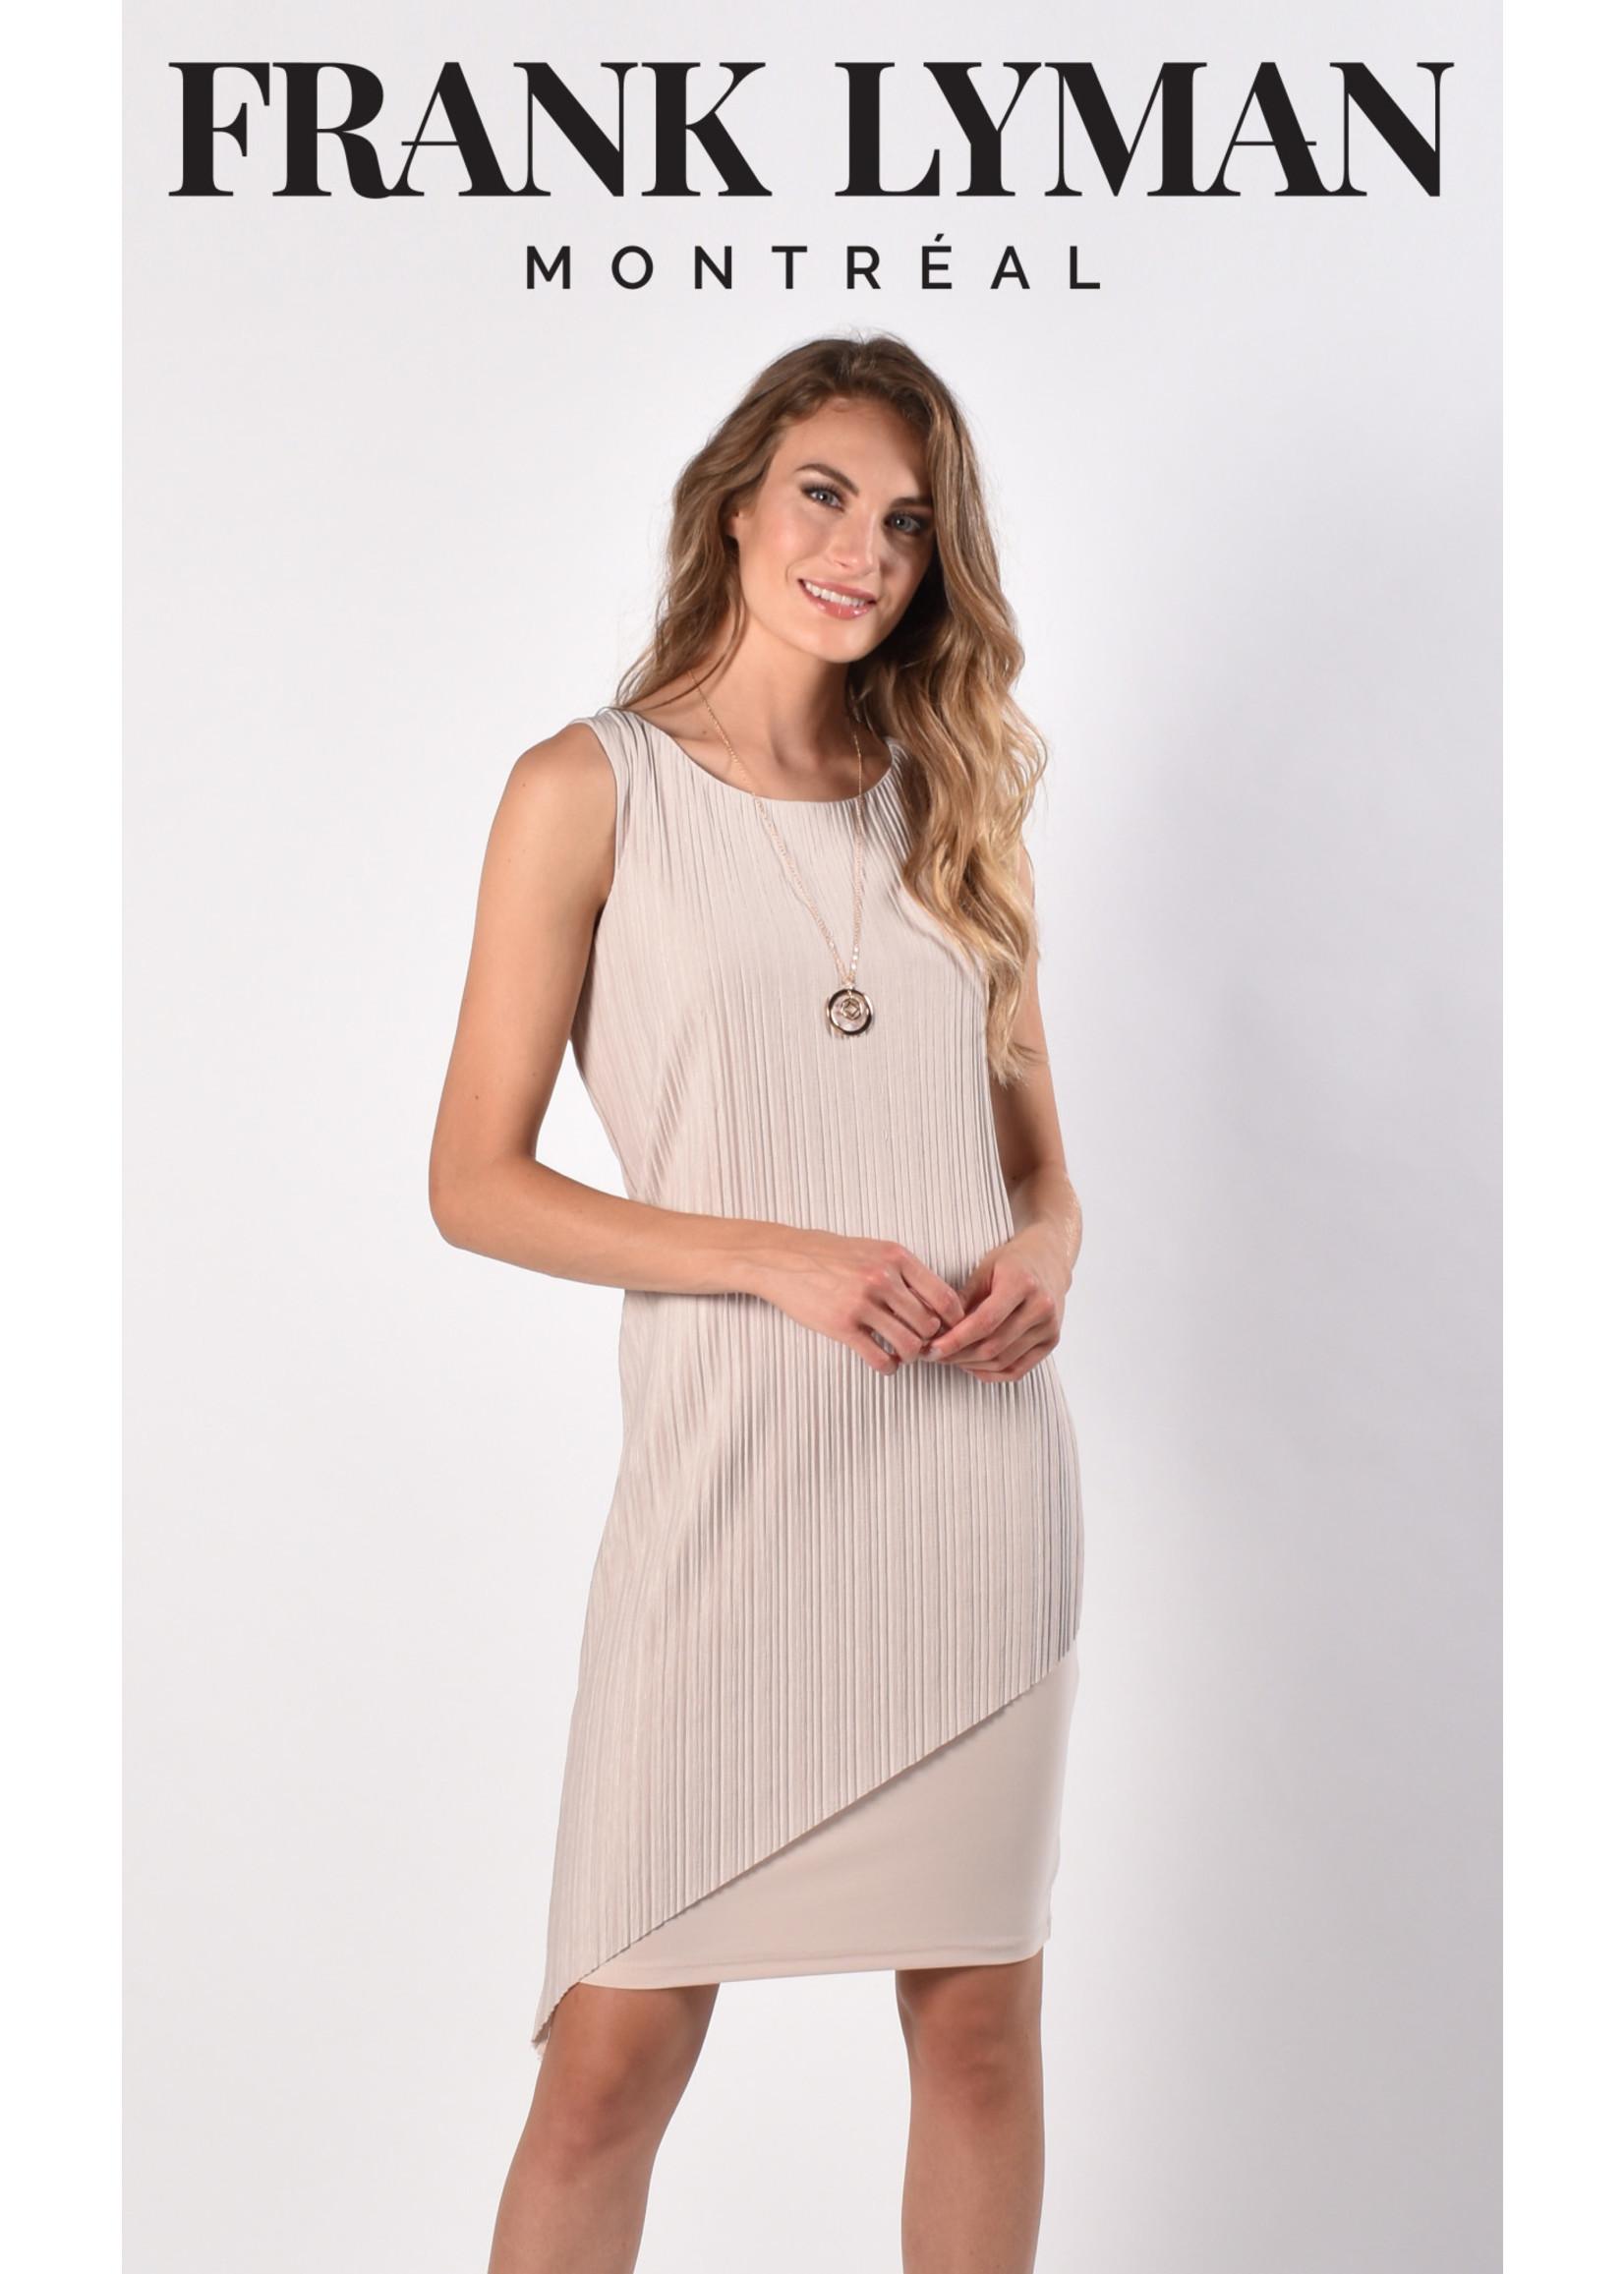 Frank Lyman Oatmeal Woven Dress